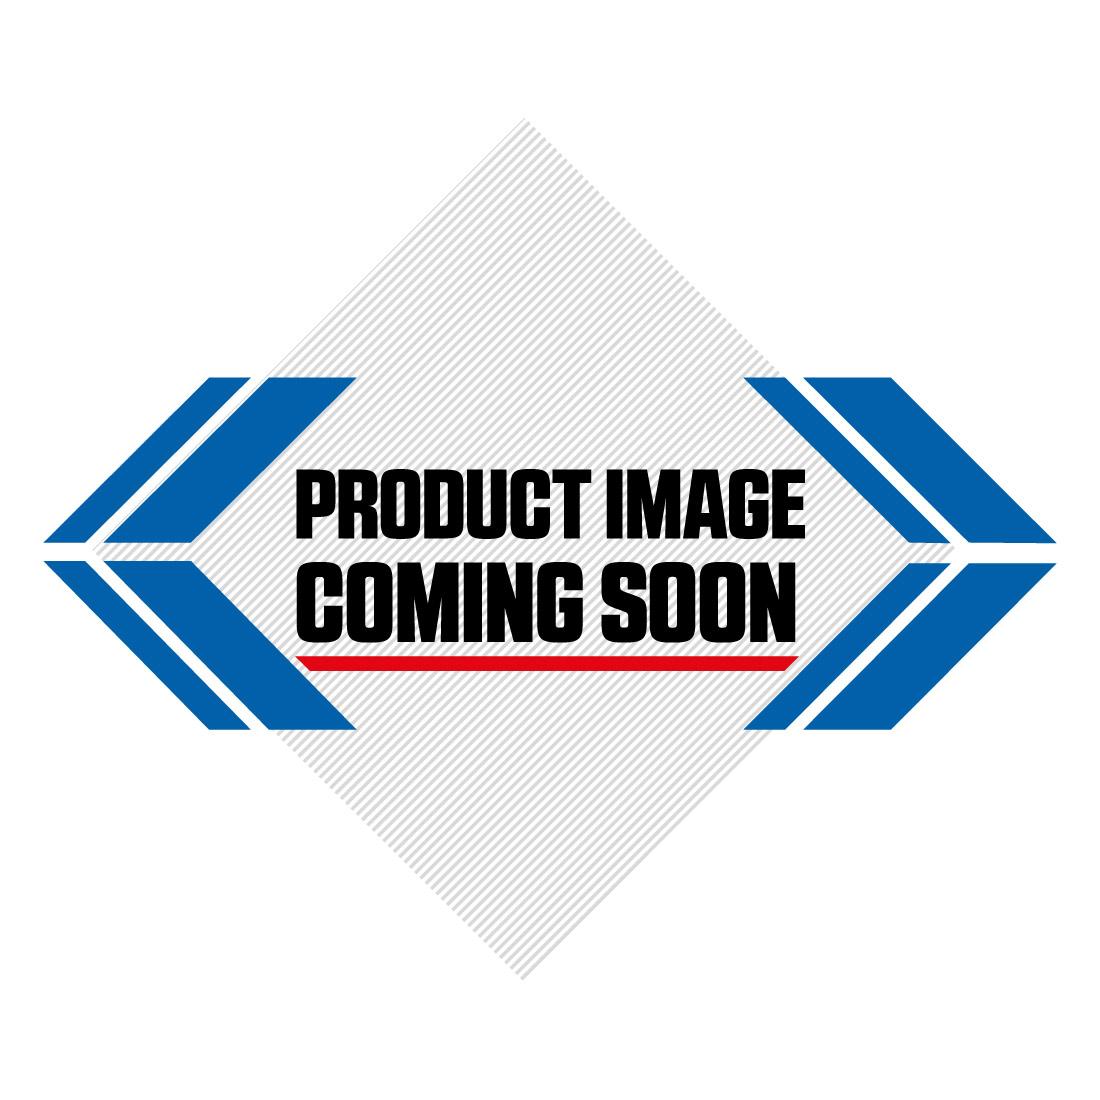 DJI Mavic Pro Fly More Combo 4K Quadcopter Drone Image-2>